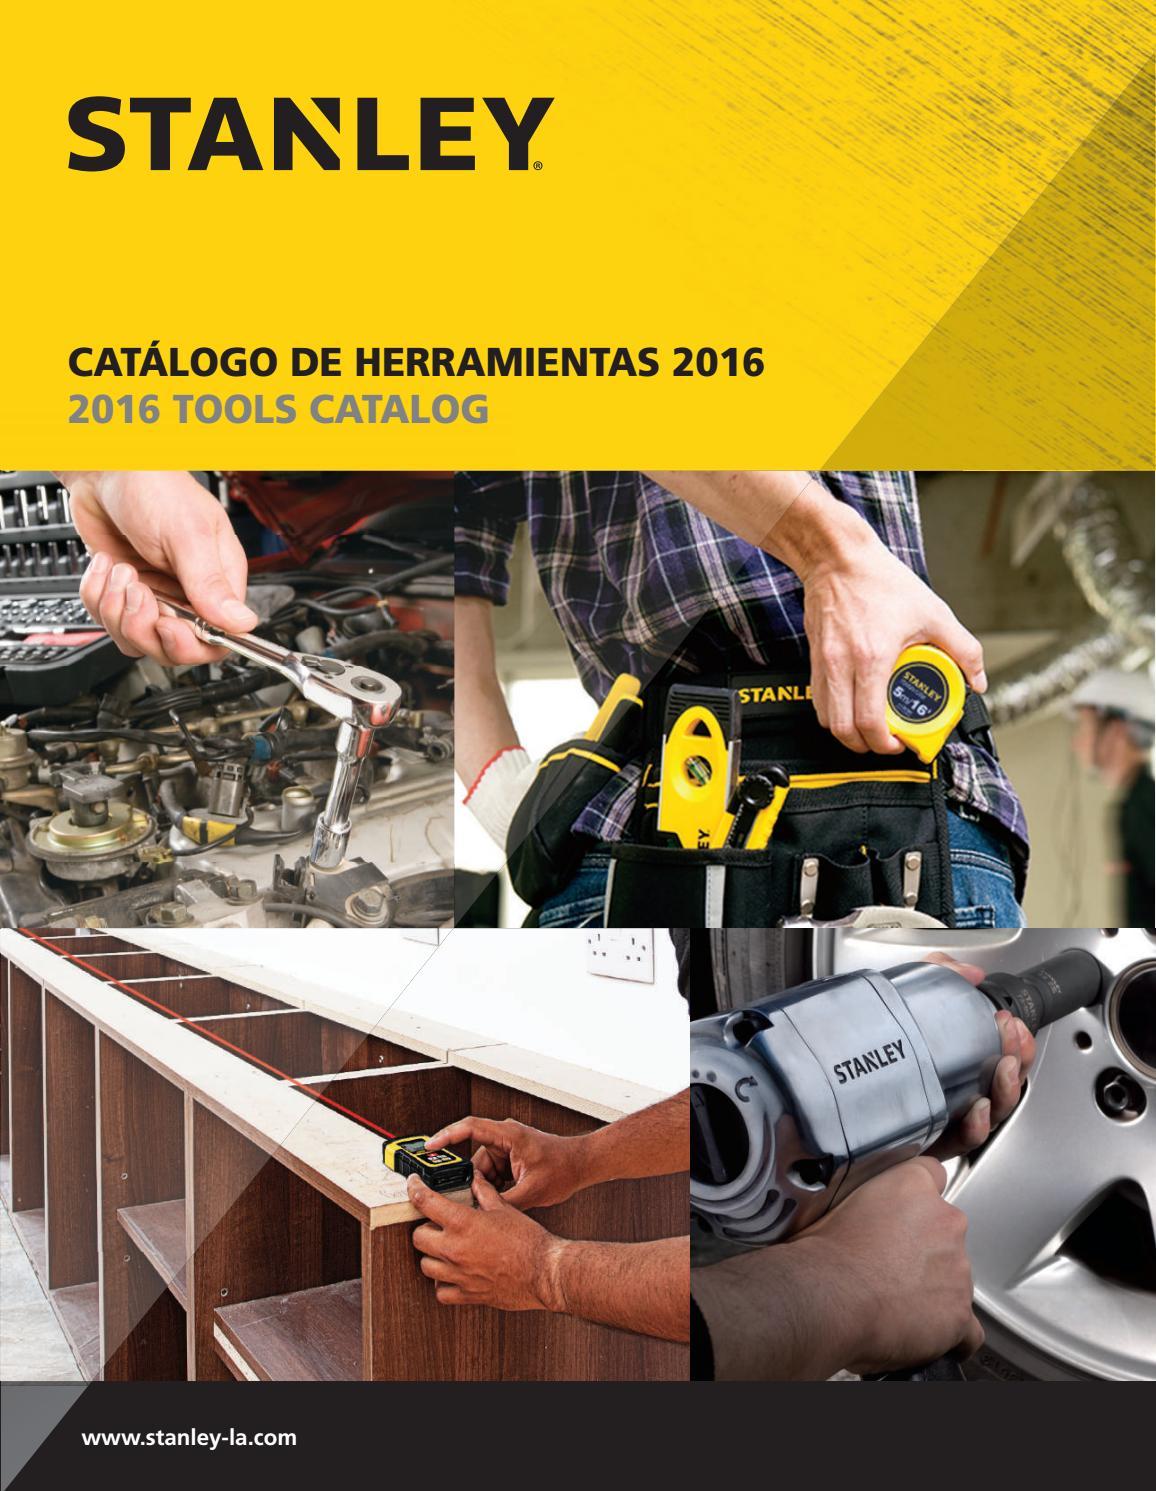 Kit Portatil De Herramientas De Carpintero Profesional 5 piece Mini Woodwork Set